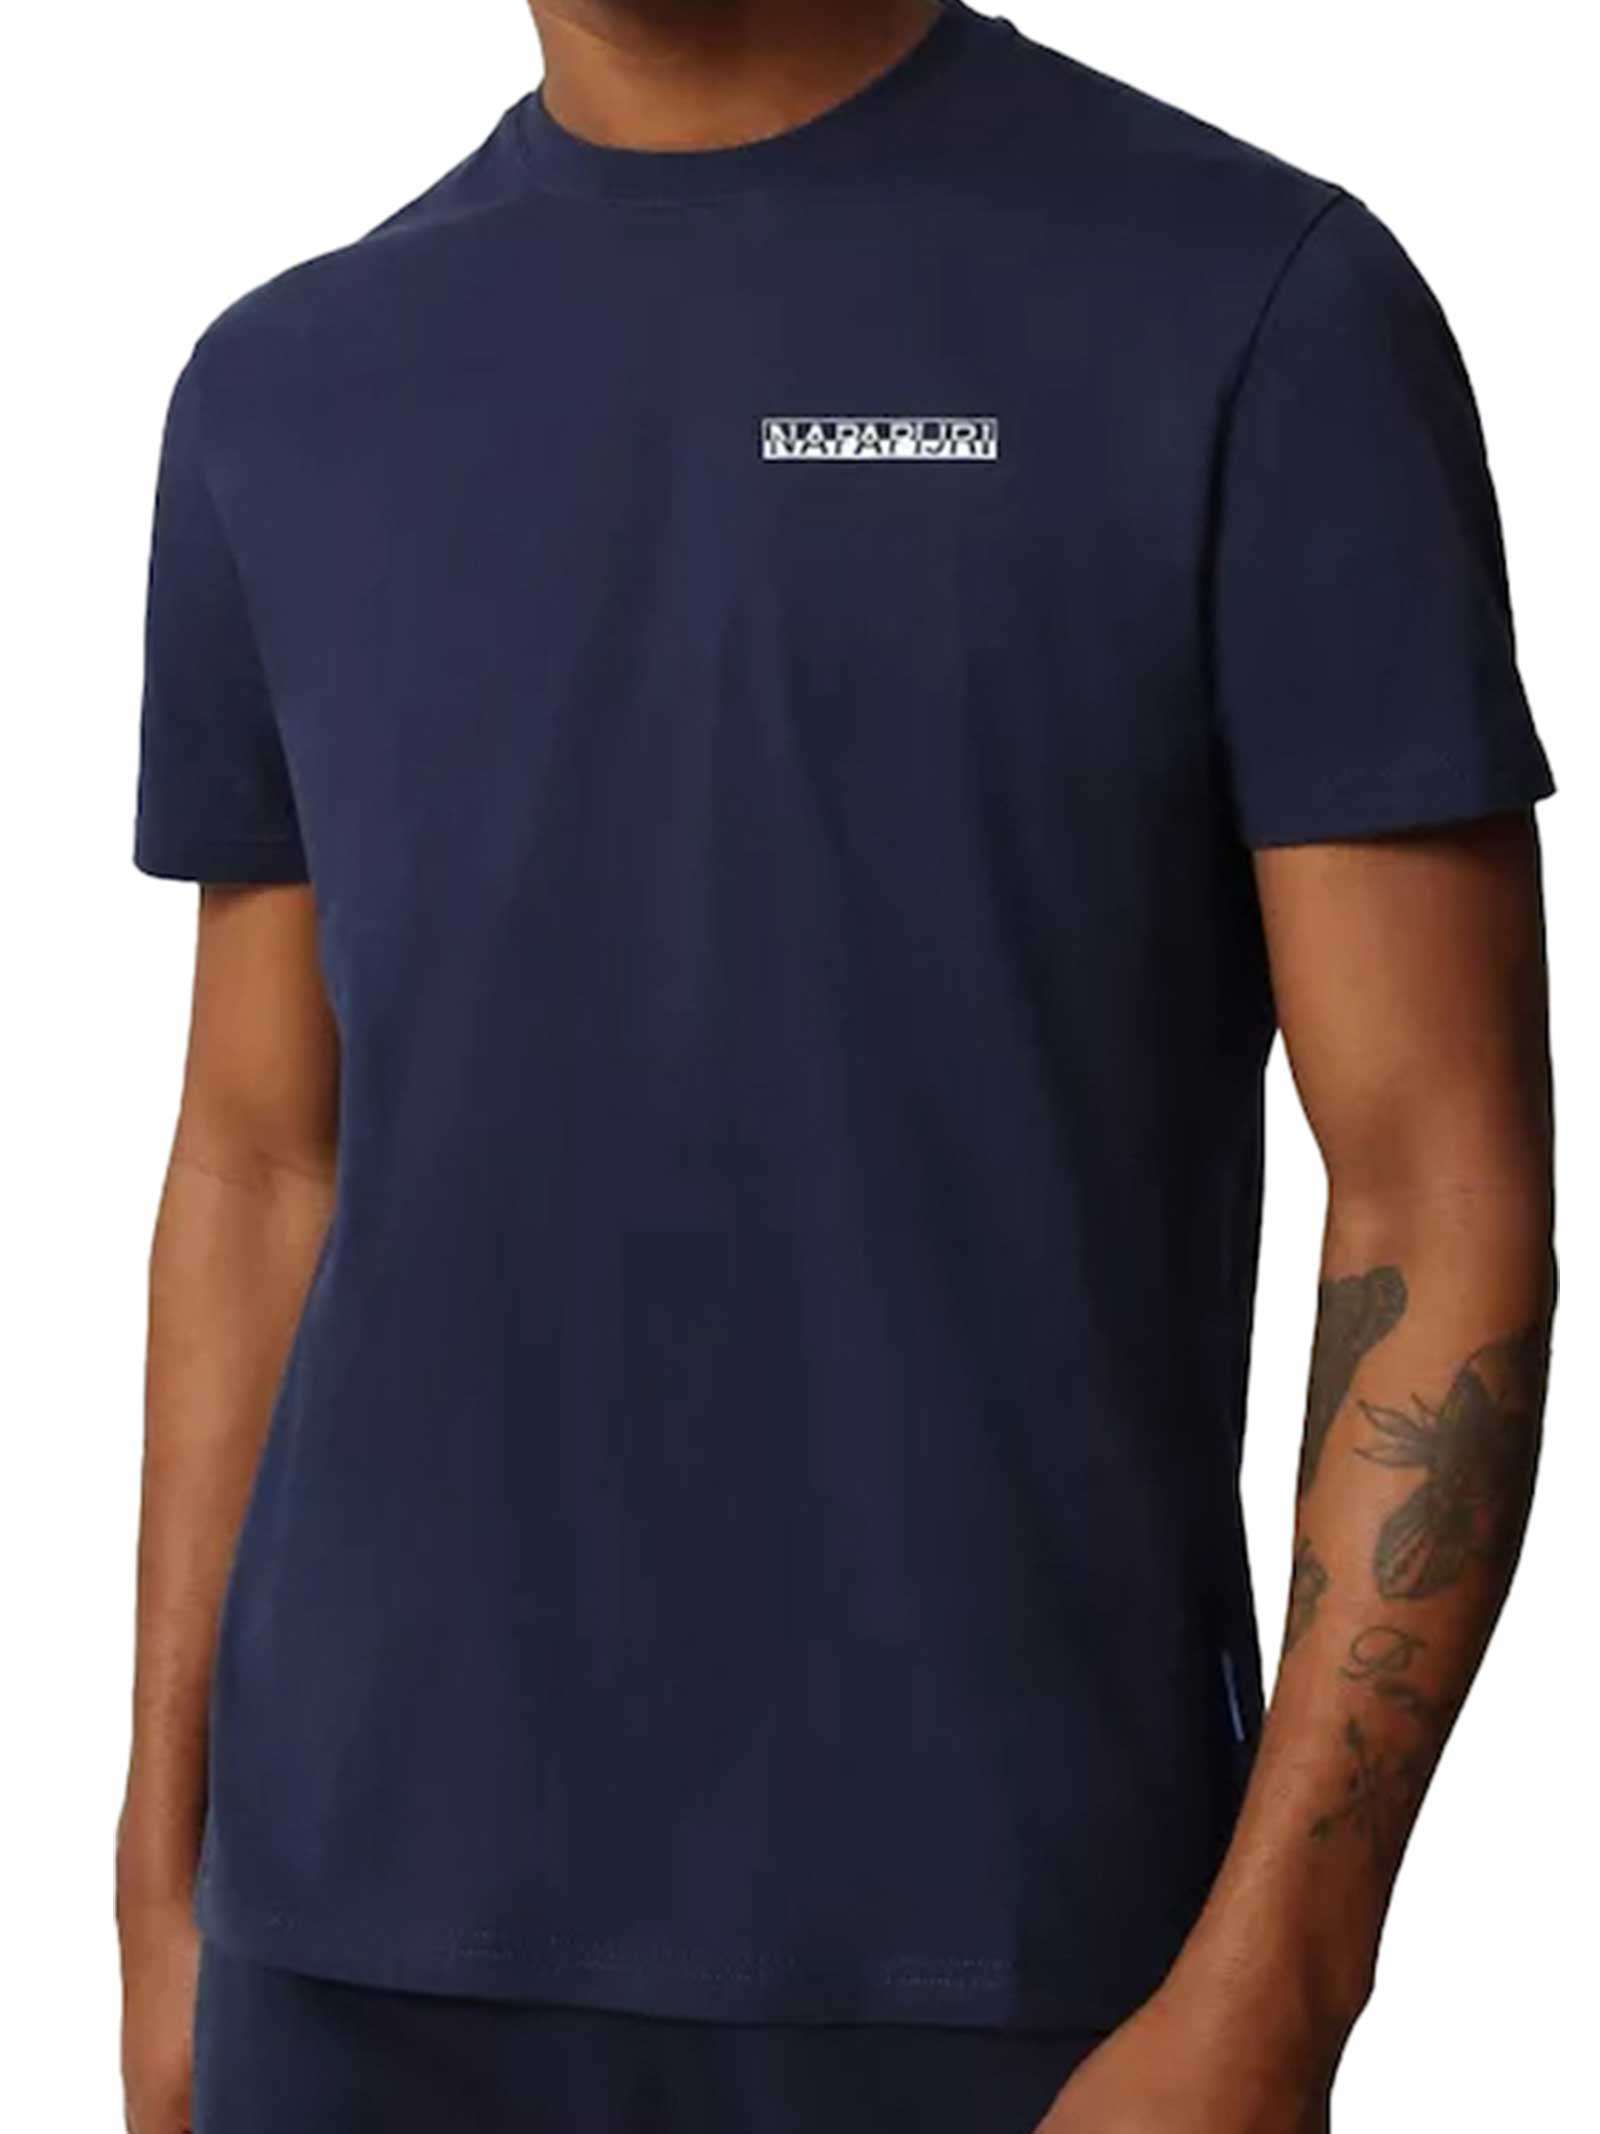 T-SHIRT UOMO NAPAPIJRI | T-shirt | NP0A4F7FBB6